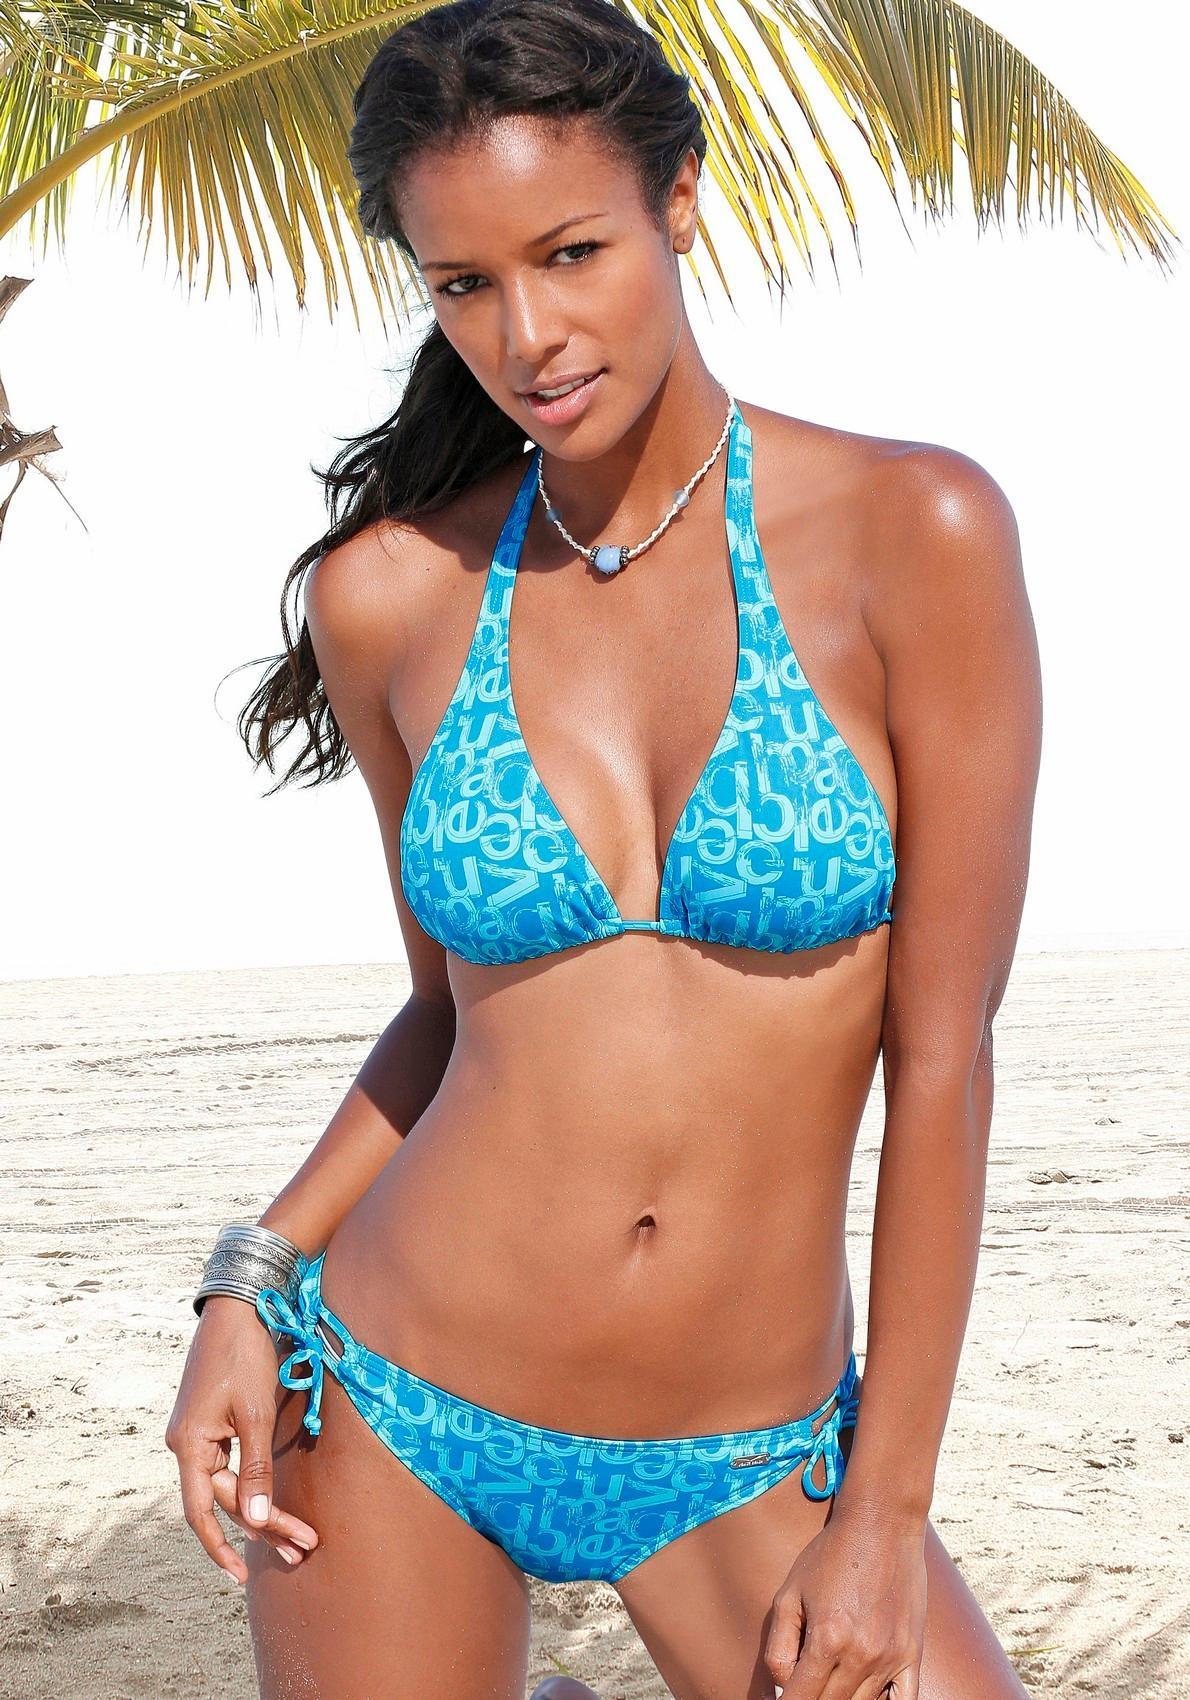 VENICE BEACH Bikinibroekje bestellen: 14 dagen bedenktijd